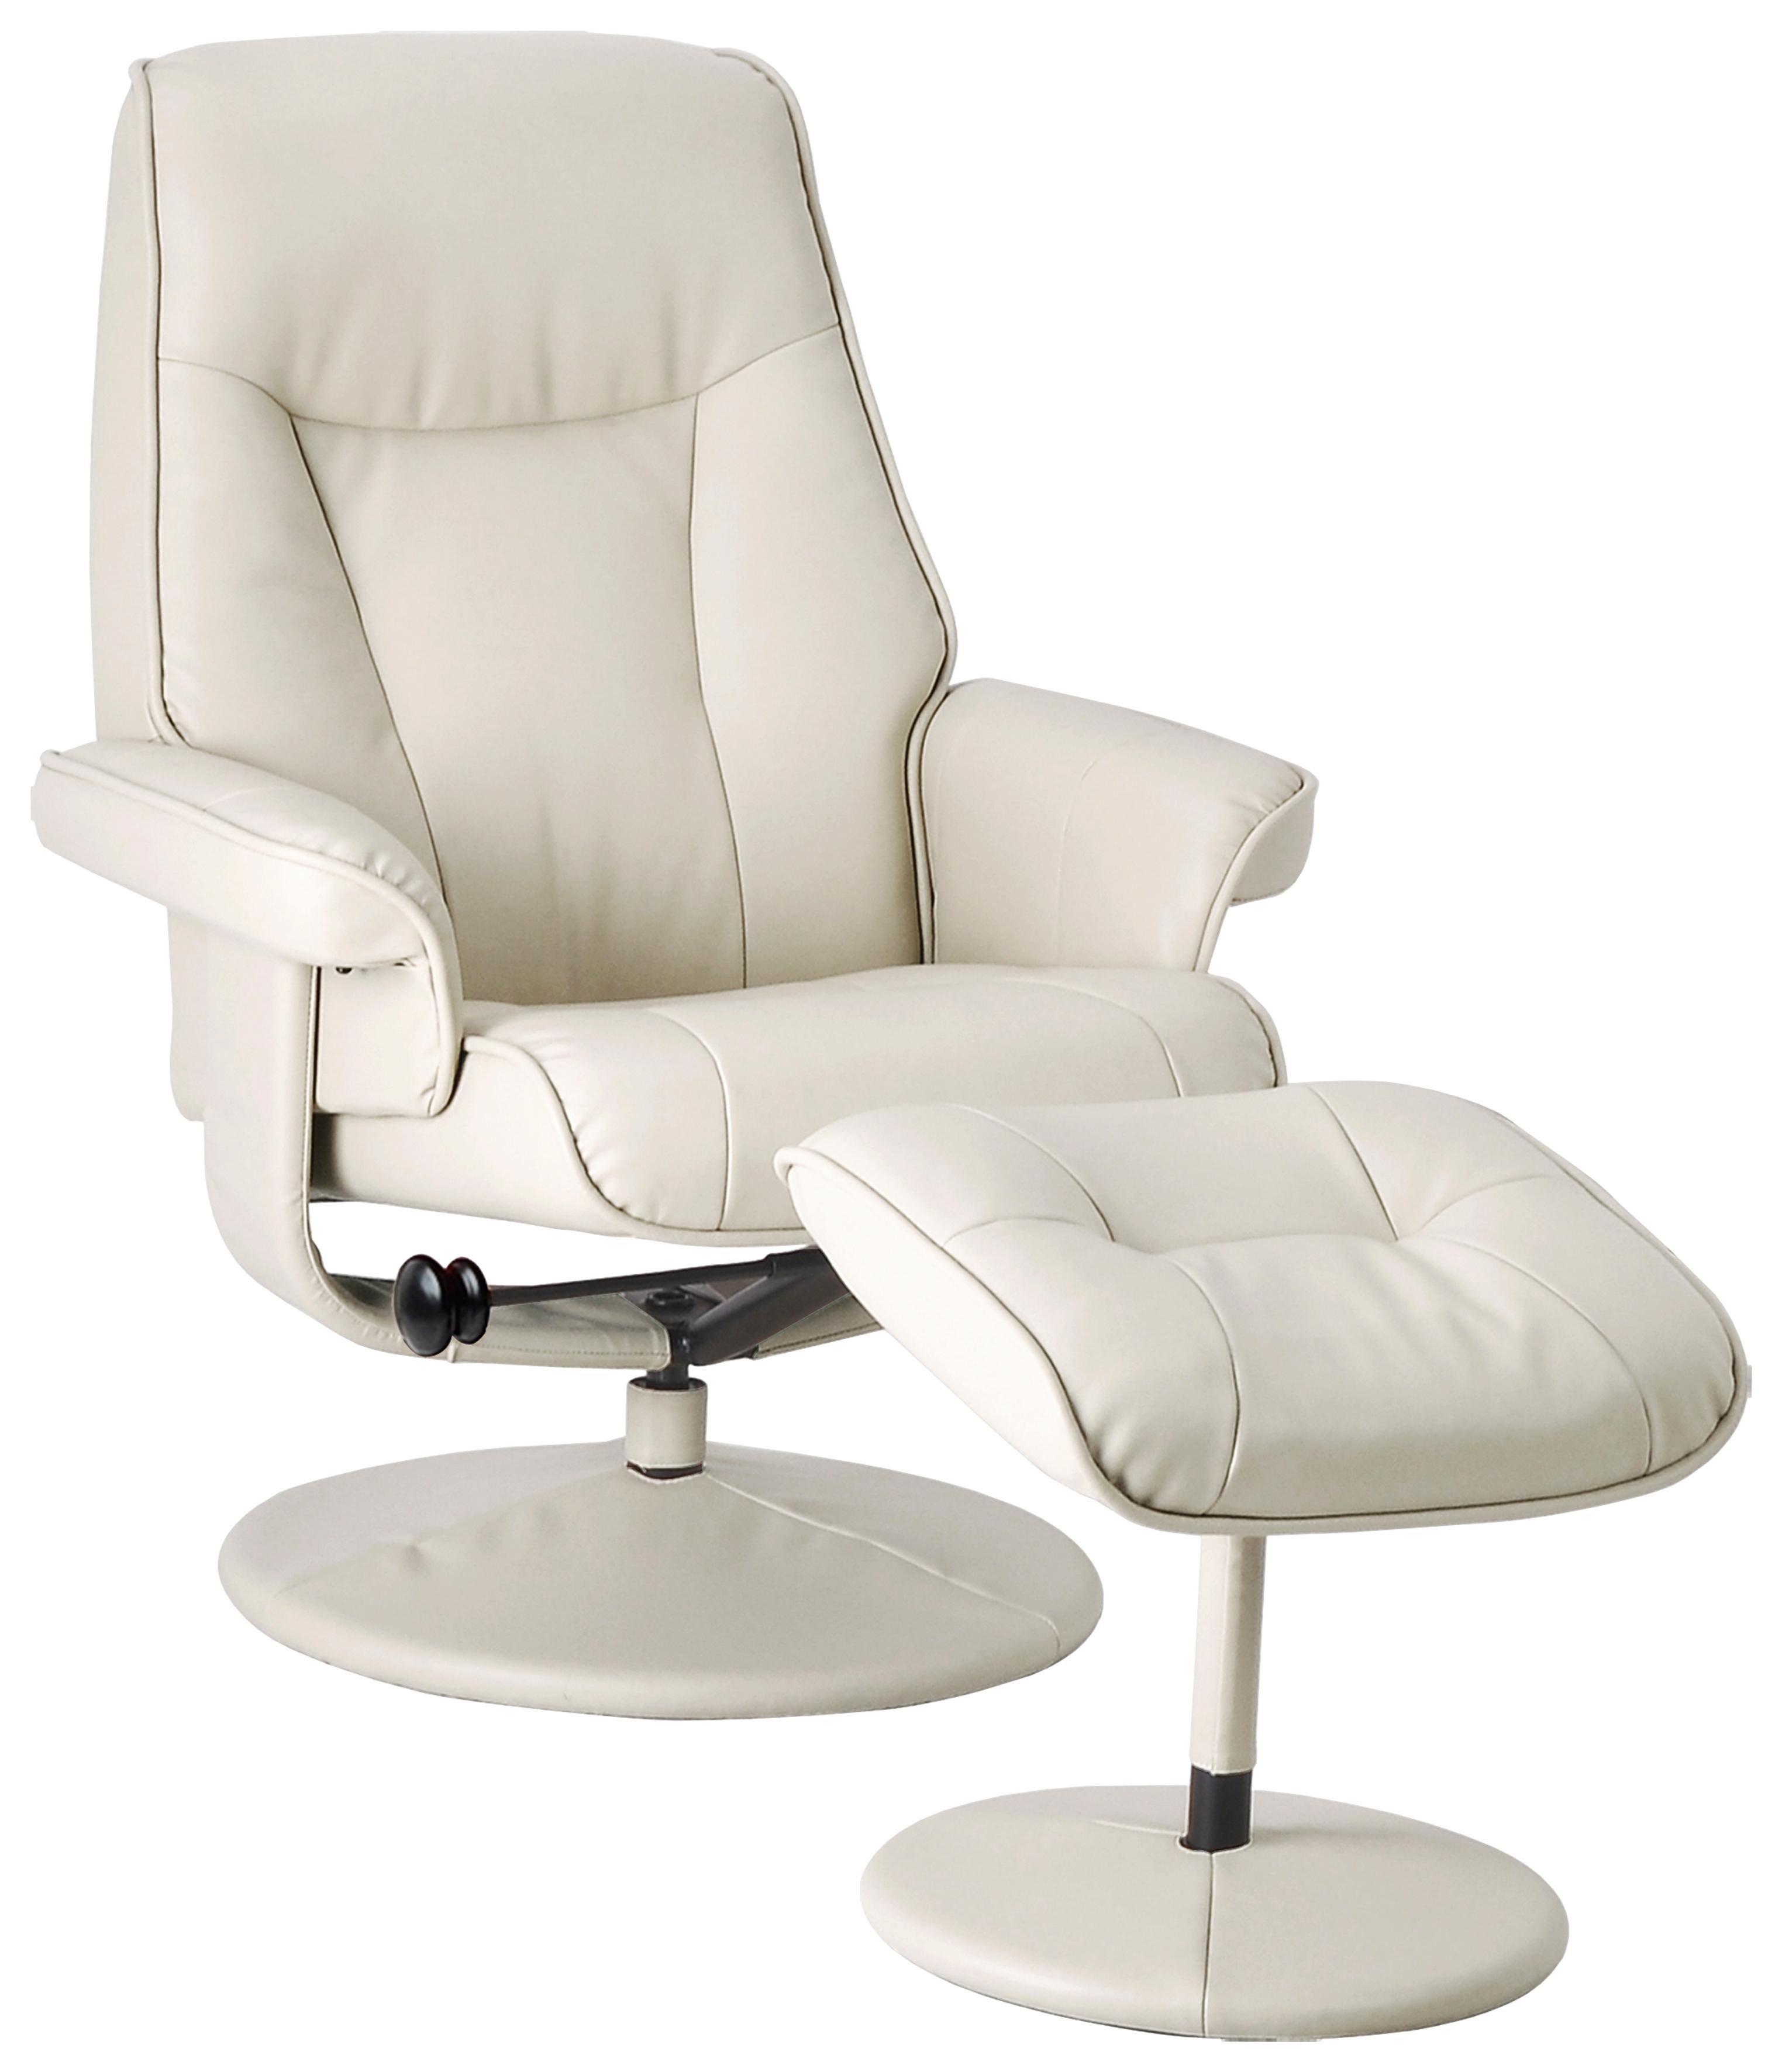 Massagesessel, inklusive Hocker   Wohnzimmer > Sessel > Massagesessel   Kunstleder